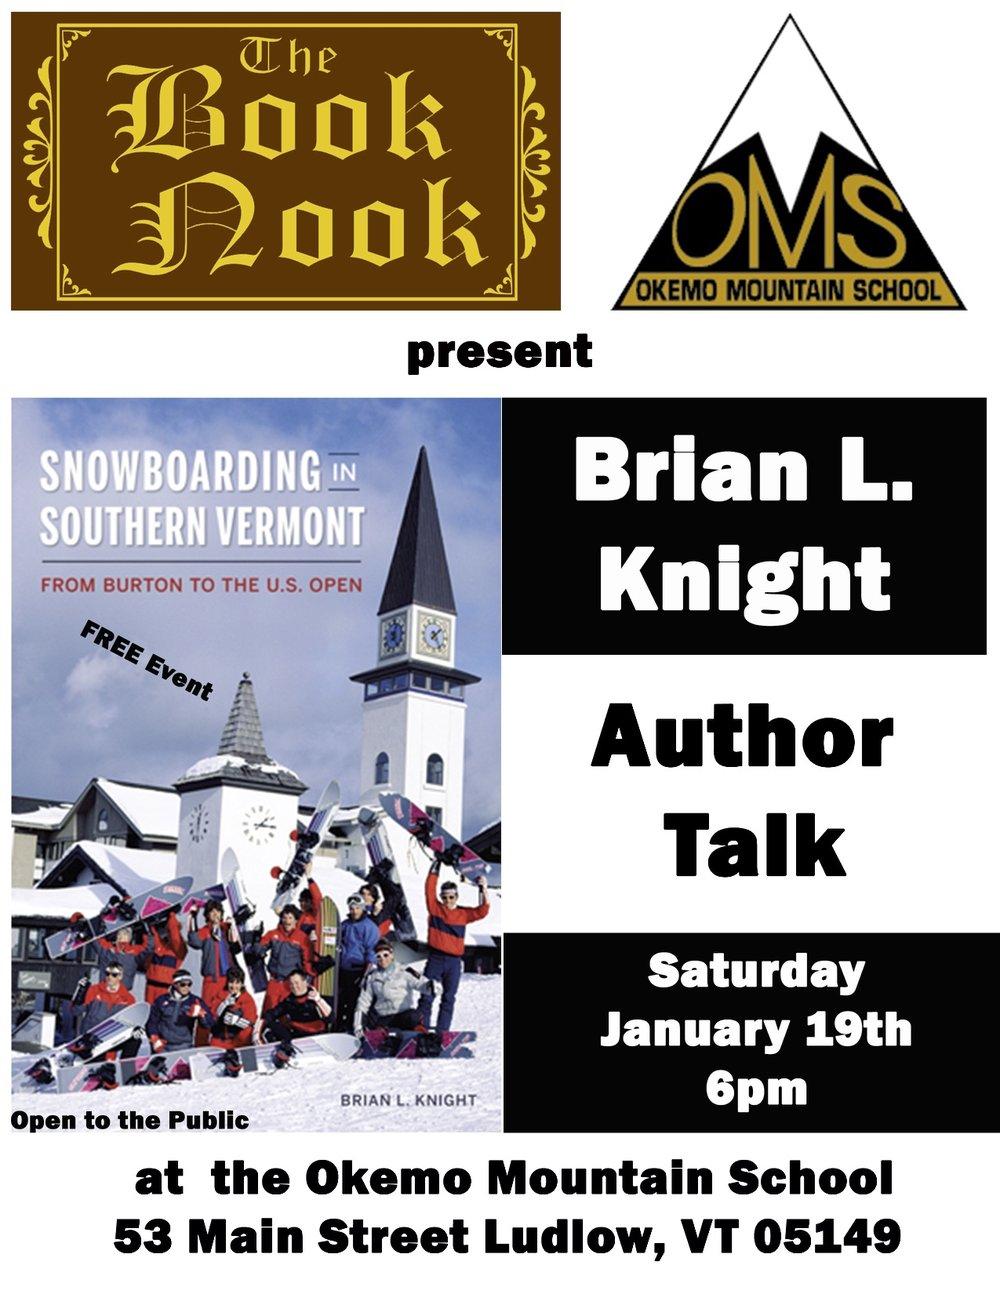 SnowboardingBookEventPoster.jpg